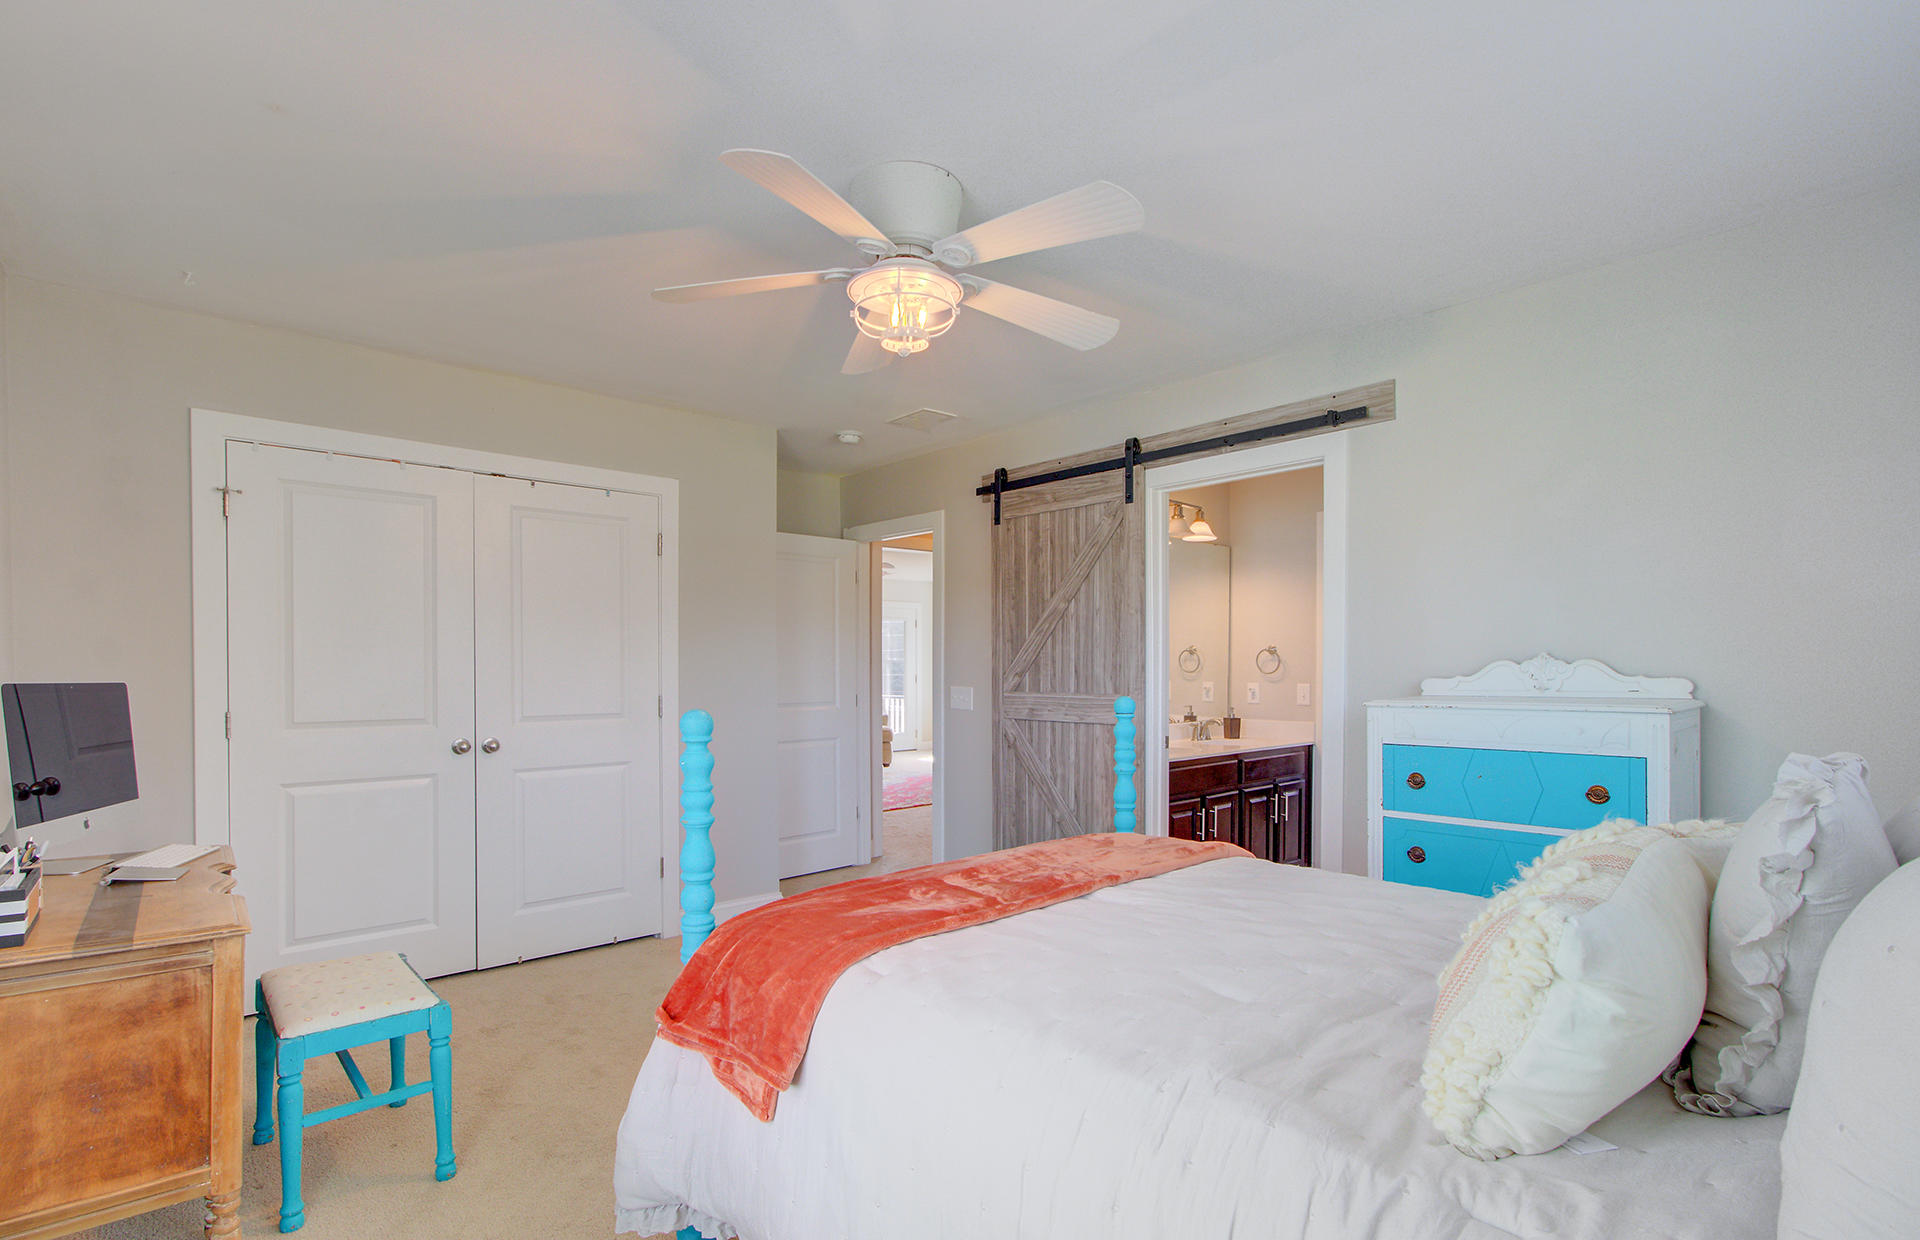 Copahee Landing Homes For Sale - 3726 Copahee Sound, Mount Pleasant, SC - 54